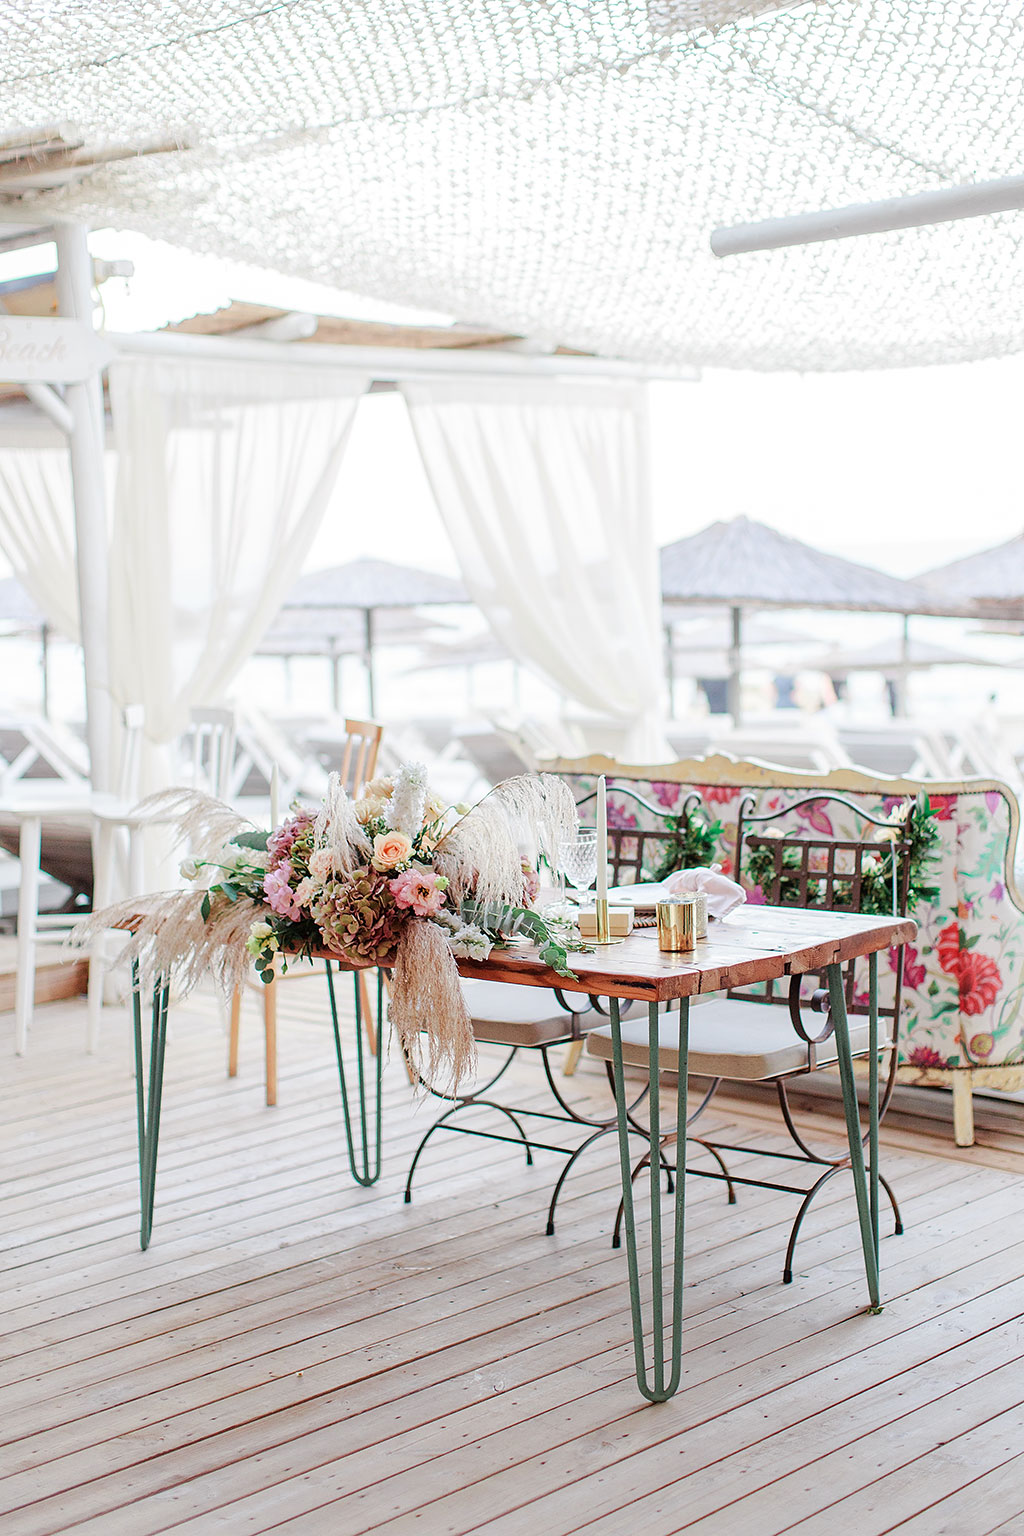 the couple's wedding table at reception, νυφικό τραπέζι στην γαμήλια δεξίωση